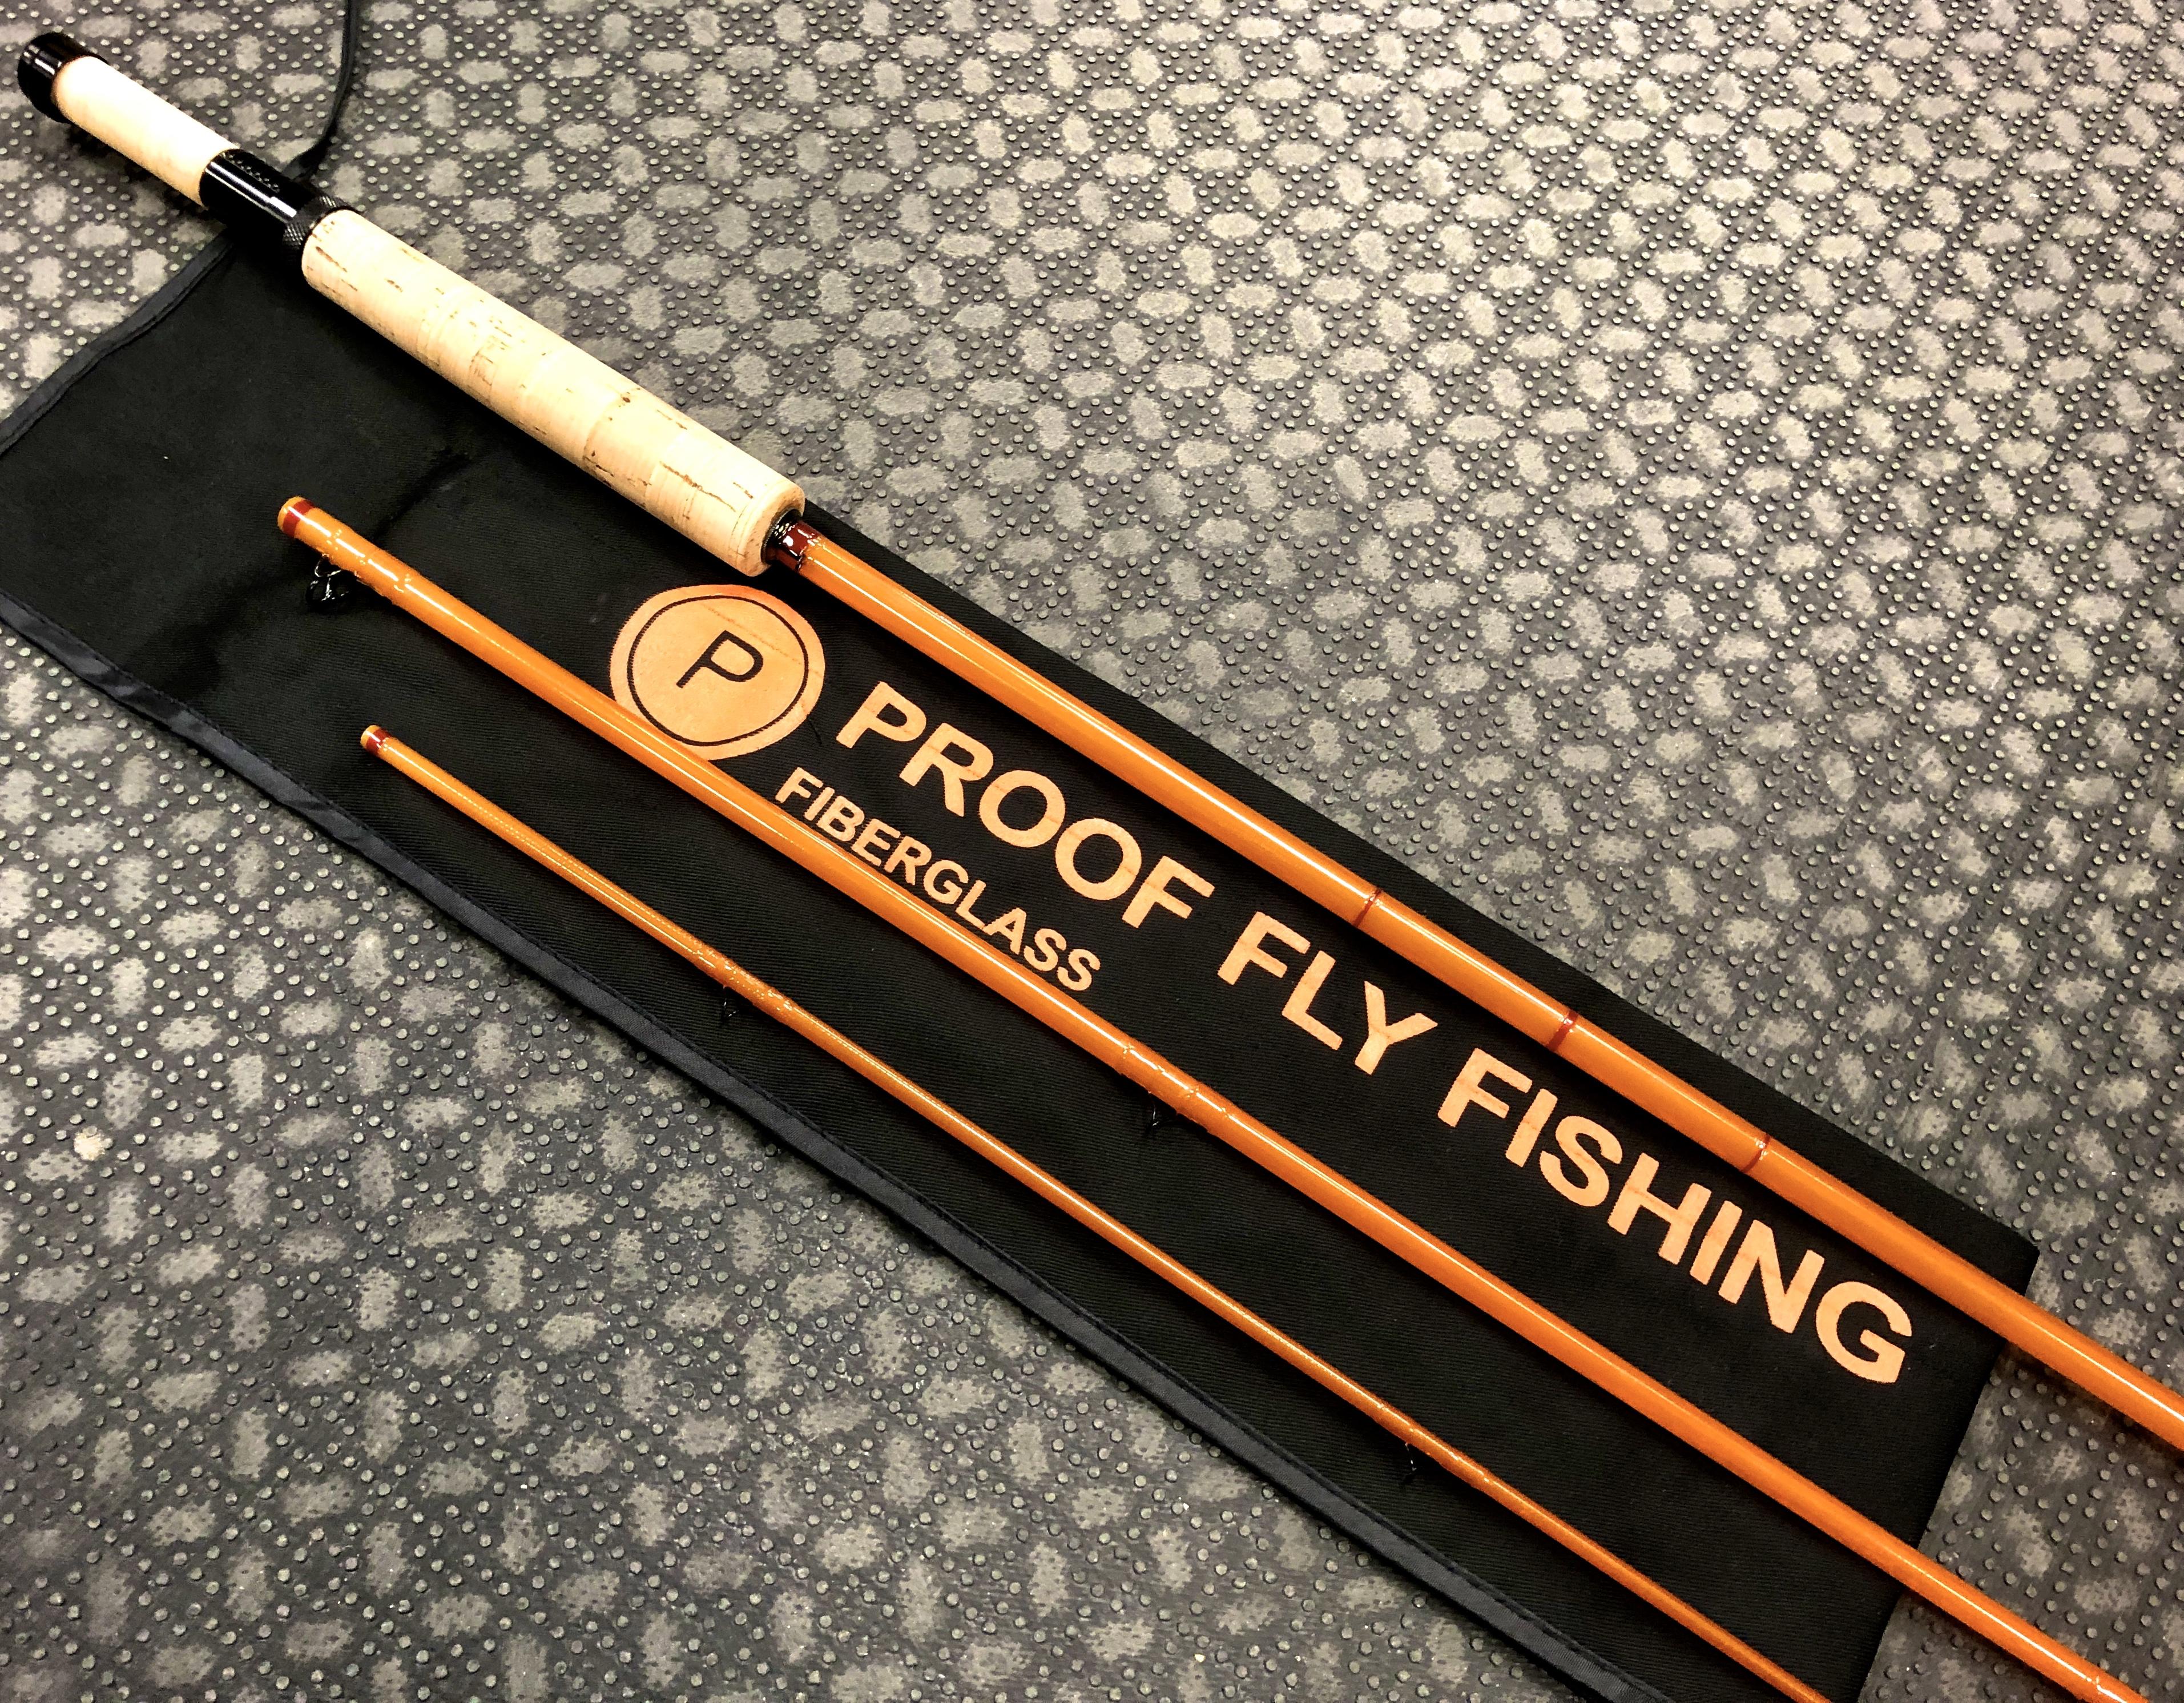 Custom Built - Proof Fly Fishing Fiberglass Kit Rod - 7 1/2' - 3Pc - 4/5Wt Fly Rod - LIKE NEW! - $95